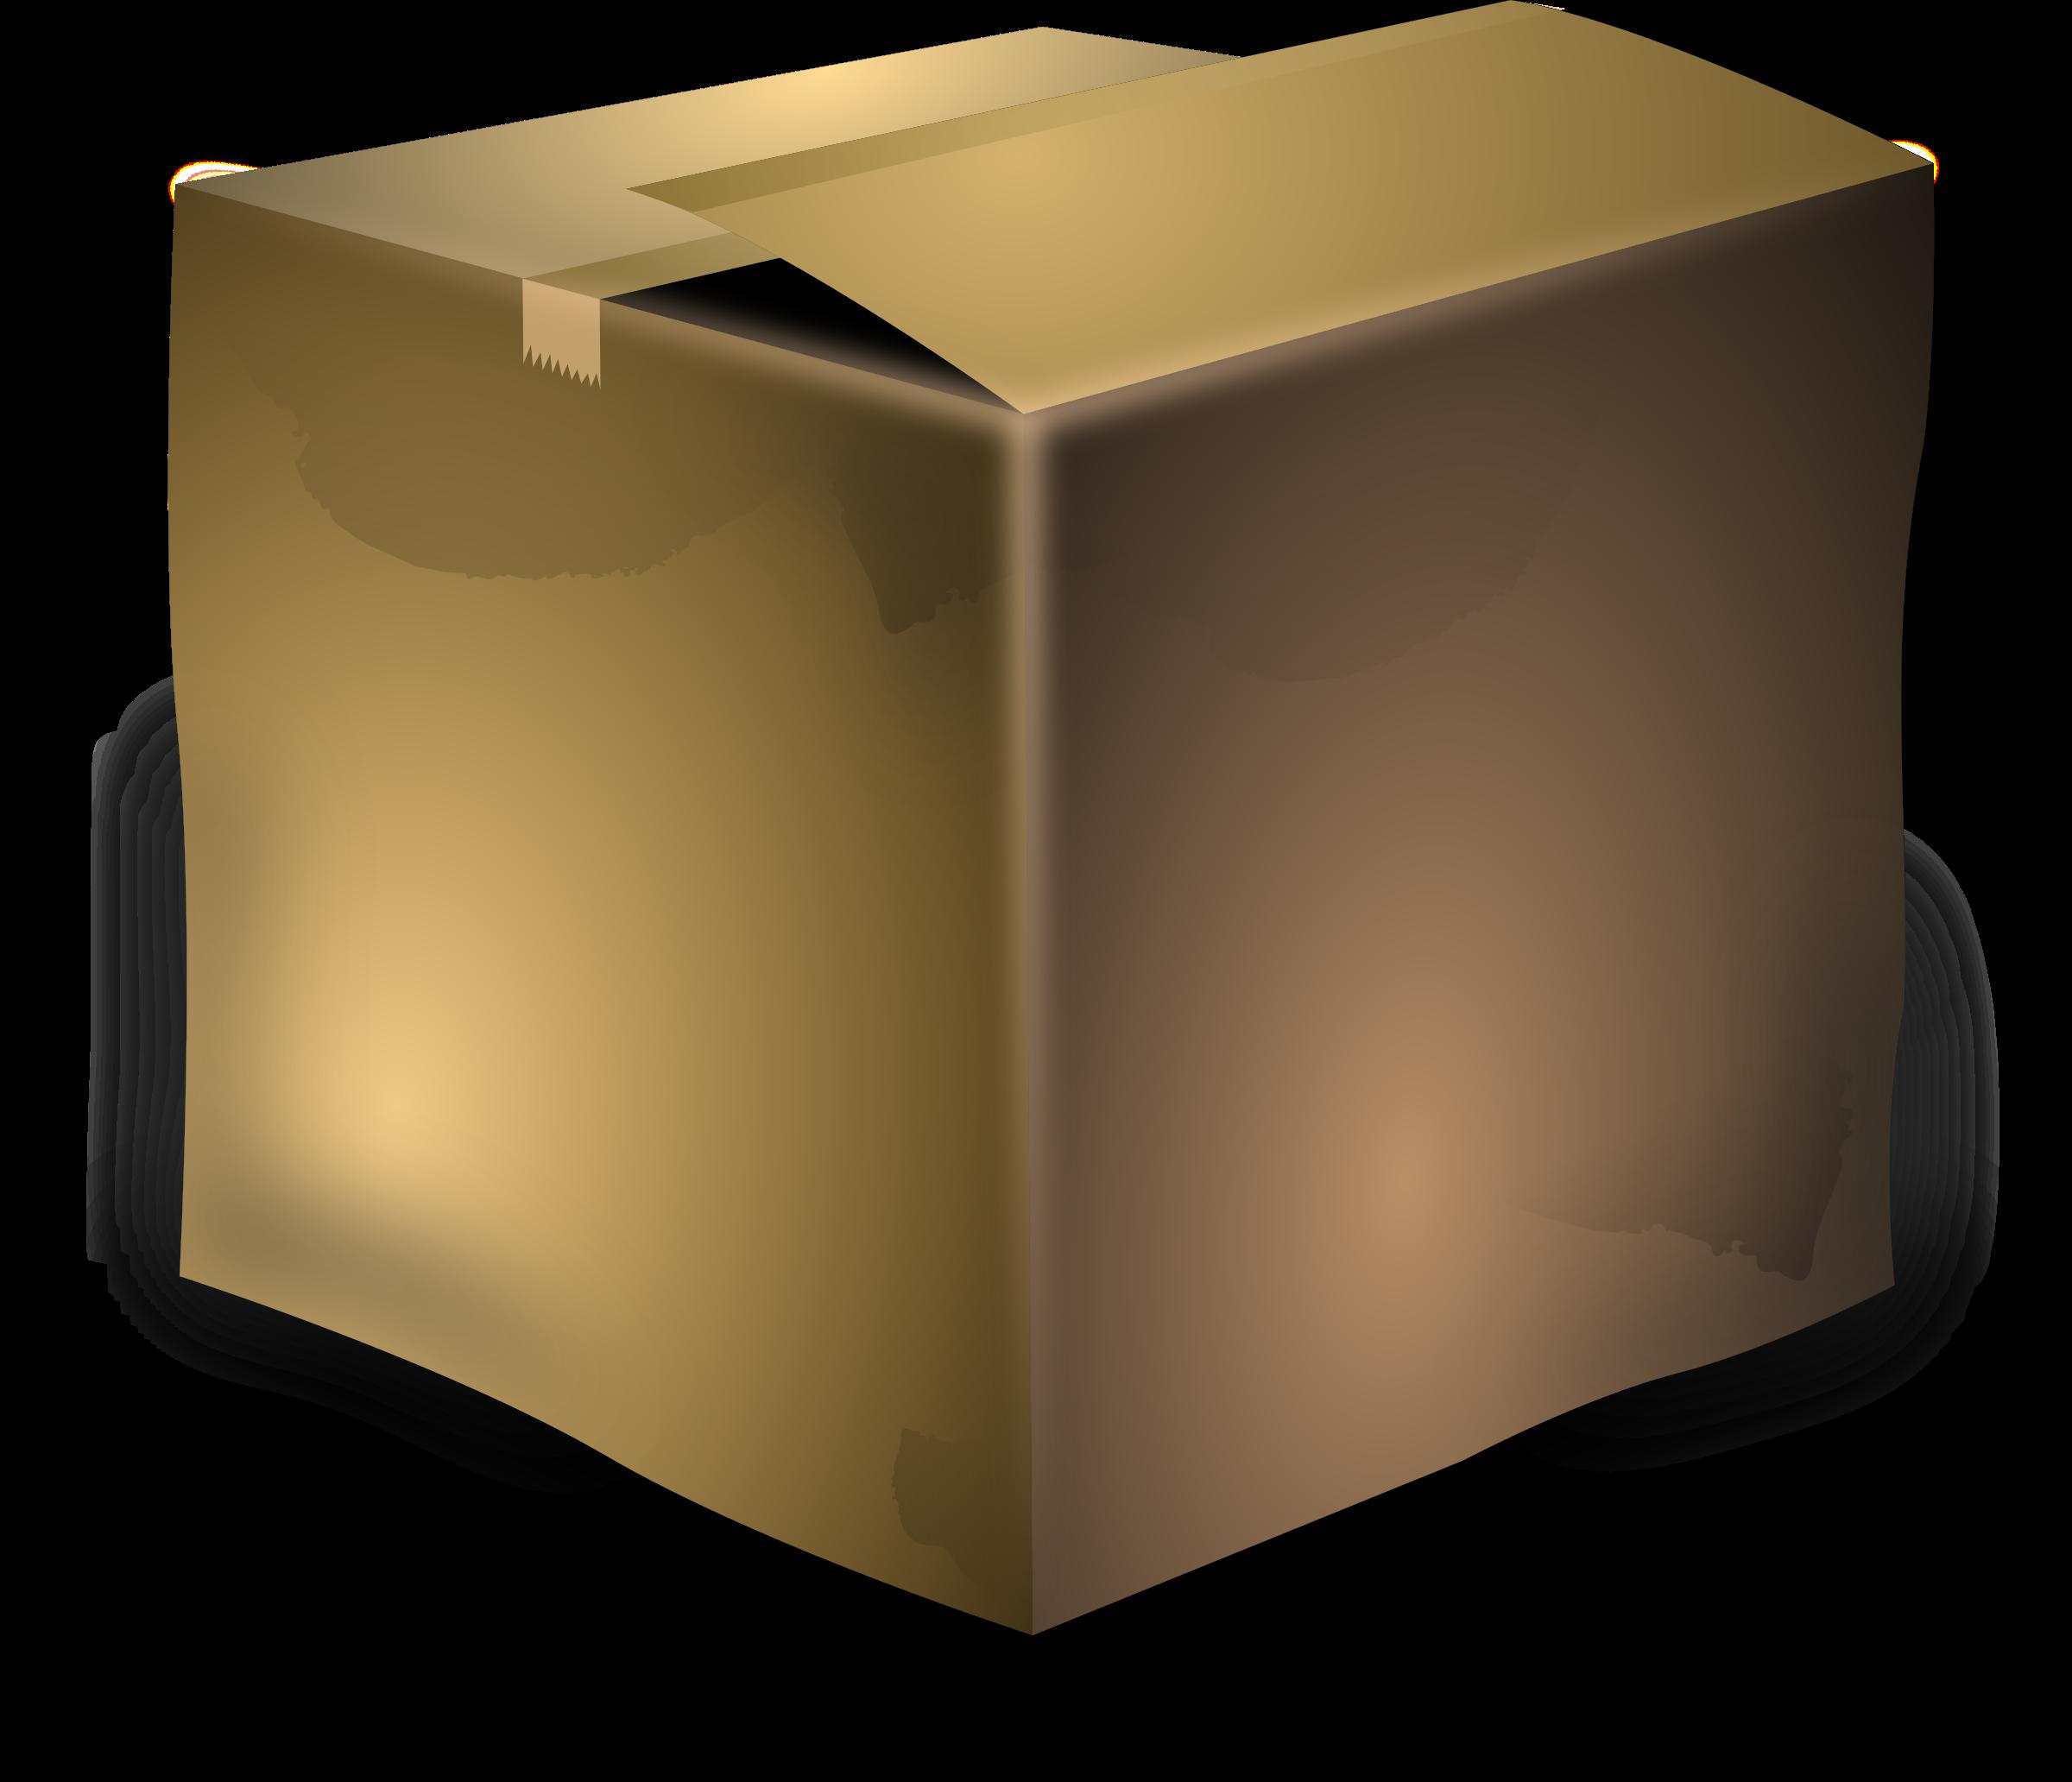 Parcel clipart cardboard box Cardboard Cardboard Clipart Box Box